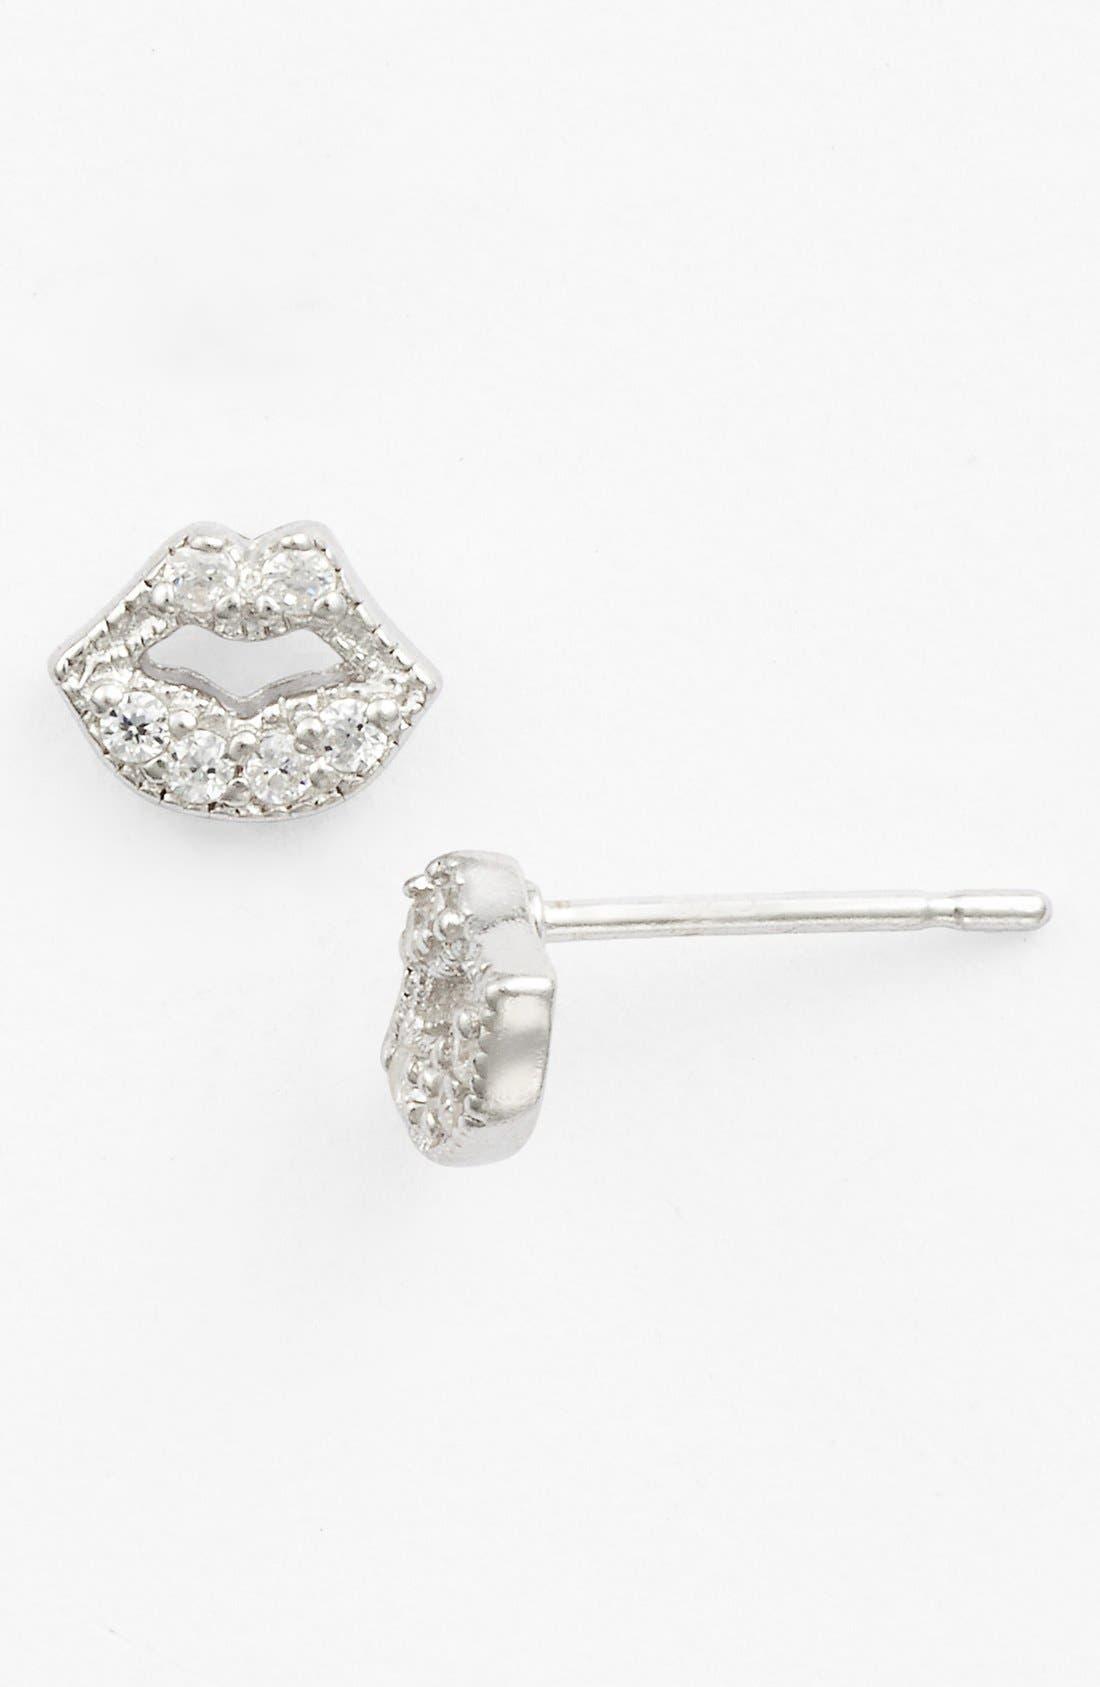 Main Image - Sugar Bean Jewelry Lips Stud Earrings